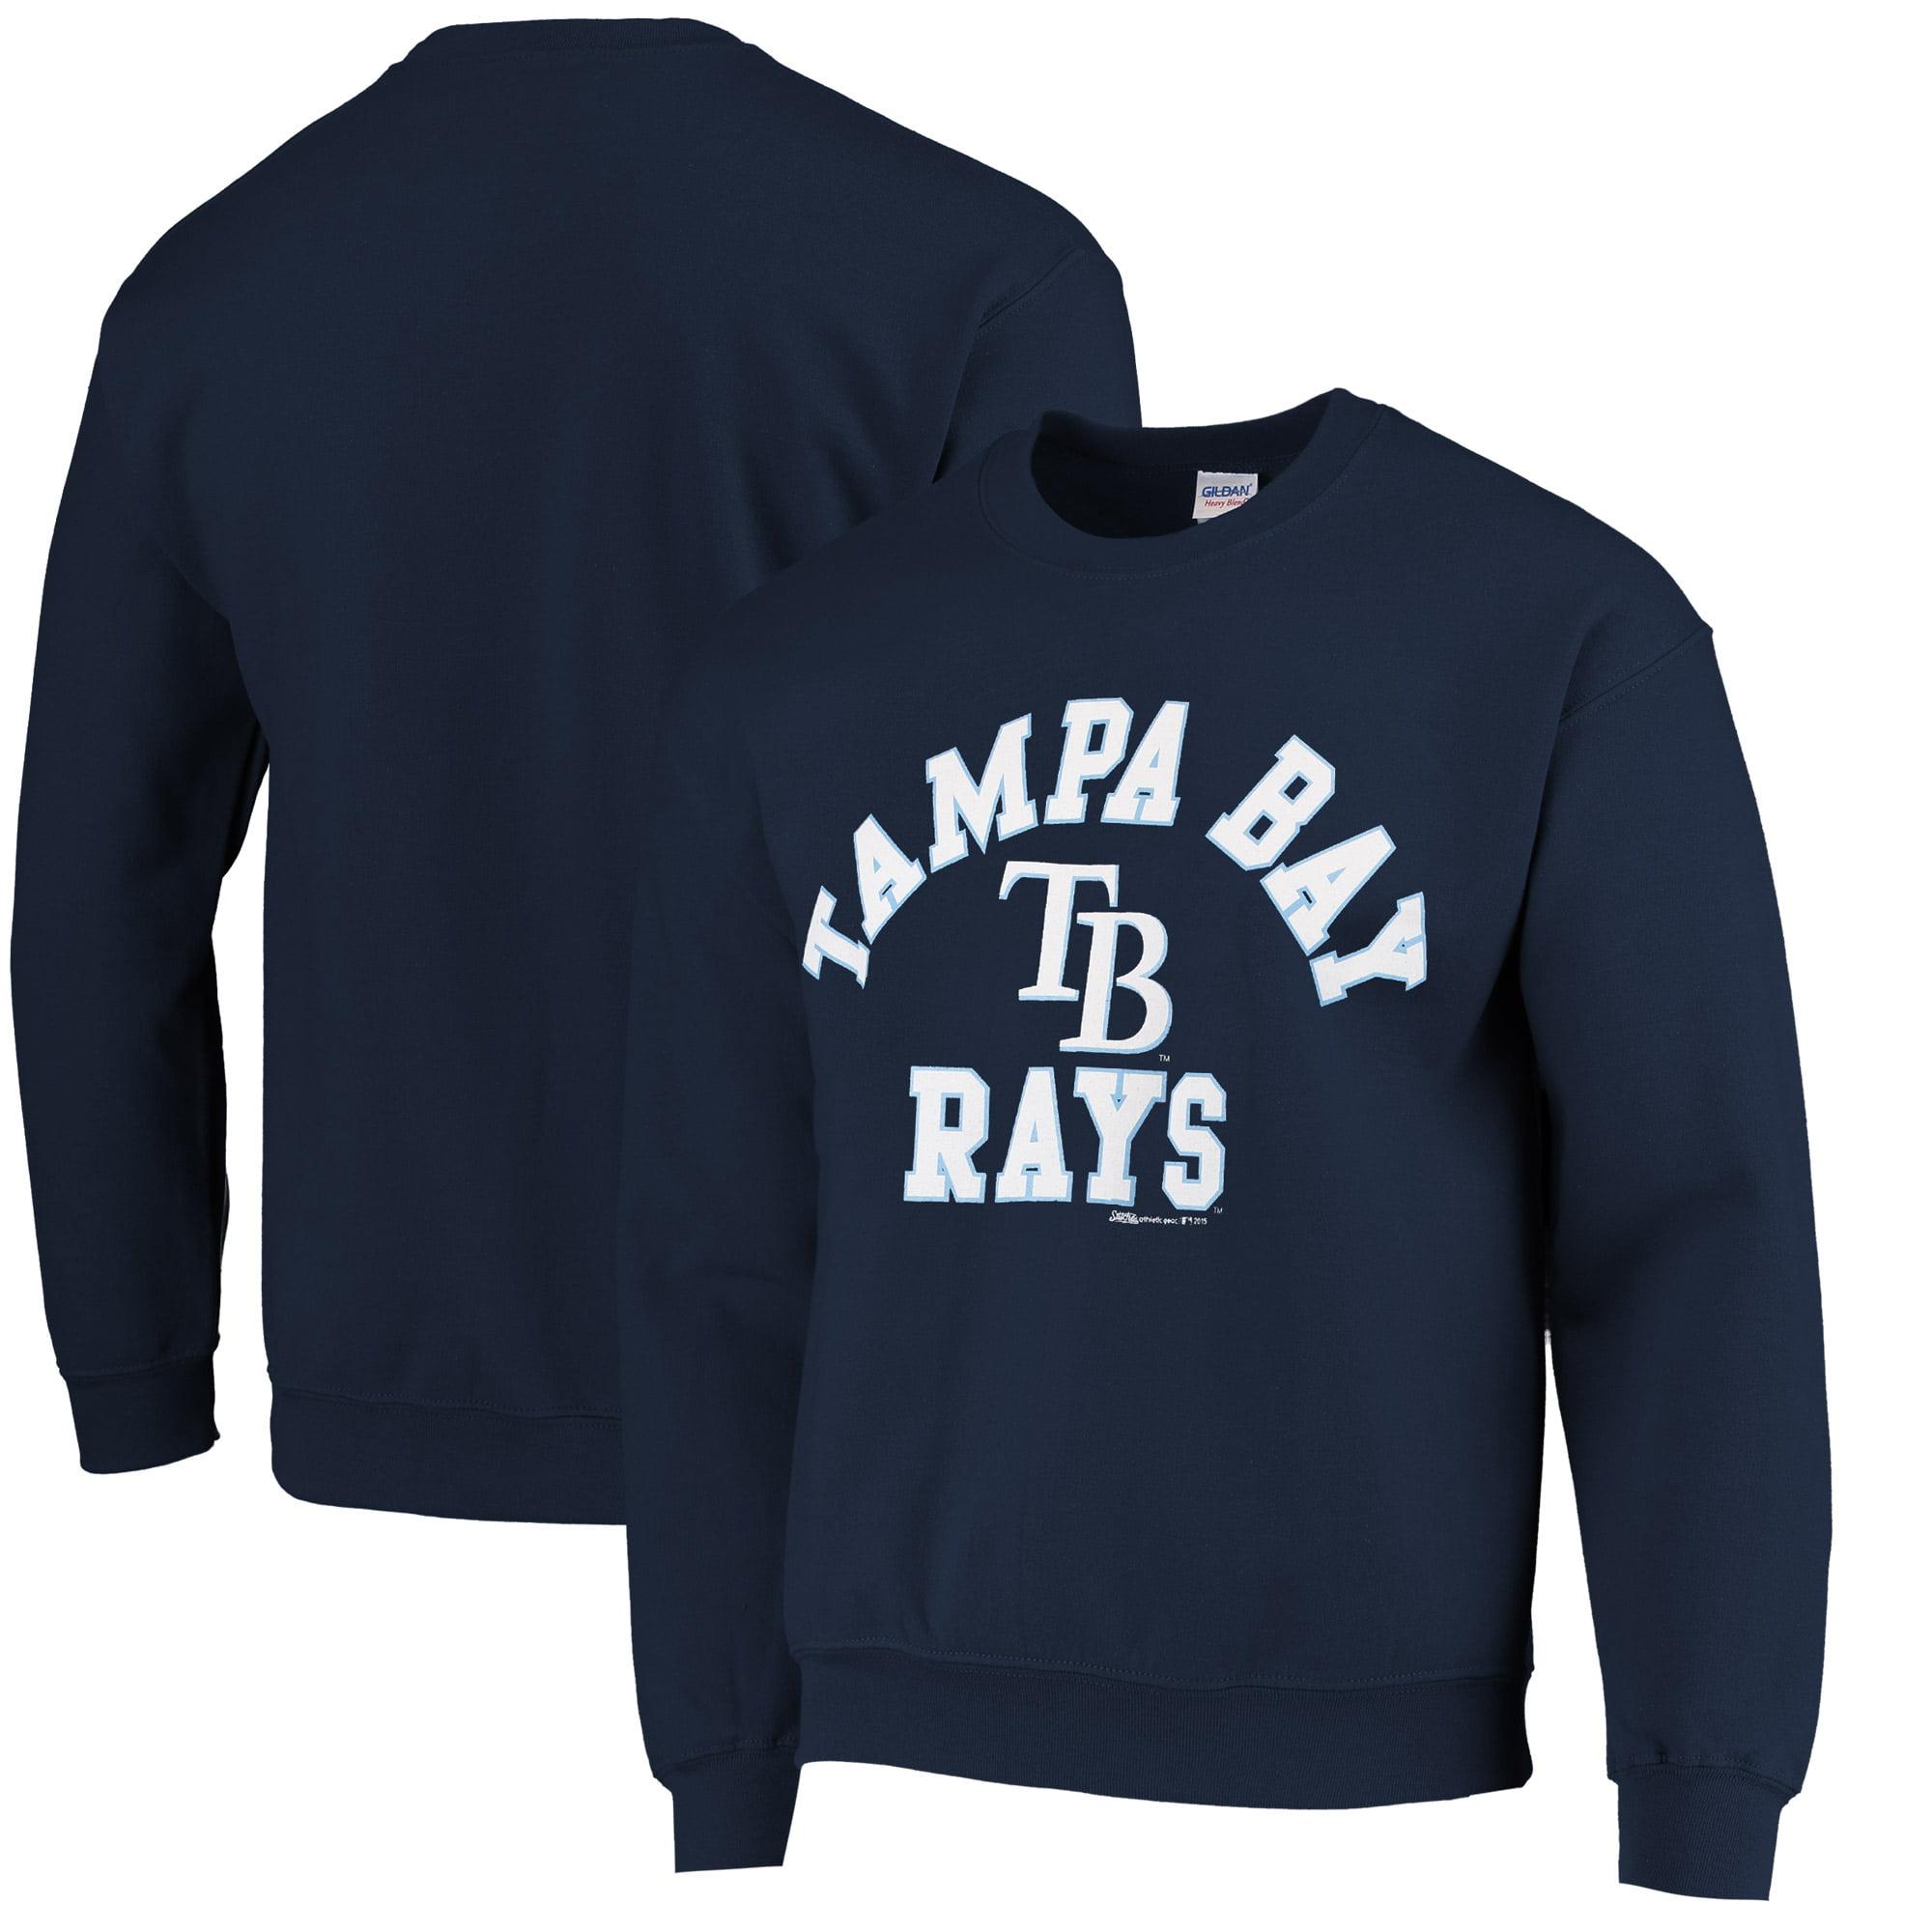 Stitches Tampa Bay Rays Warning Track Crewneck Sweatshirt - Navy Blue